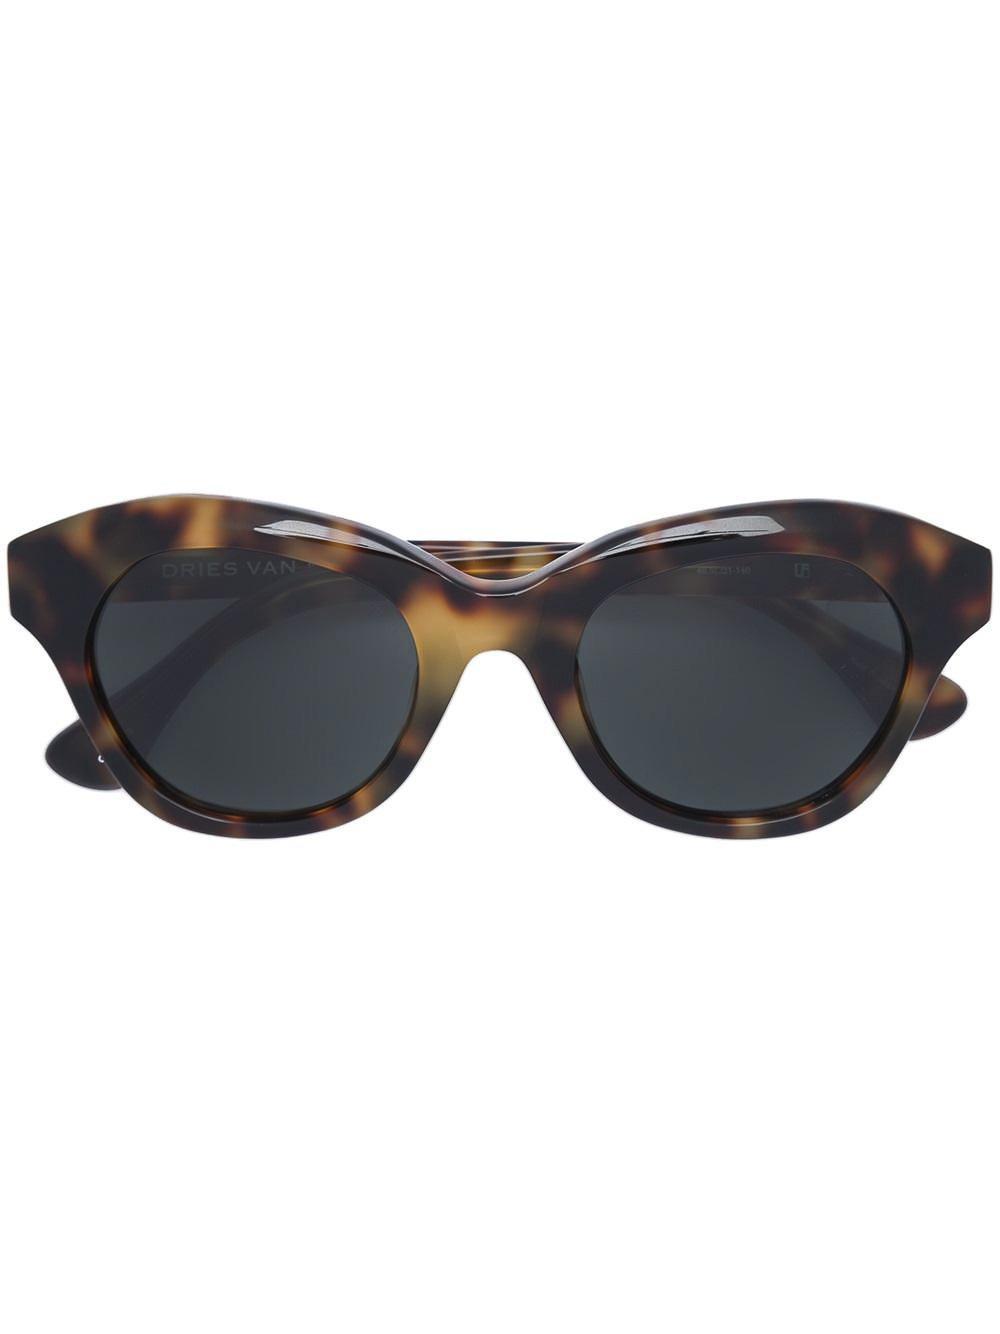 d3daa508ca5 Linda Farrow. Women s Dries Van Noten X Blurred Leopard Print Sunglasses